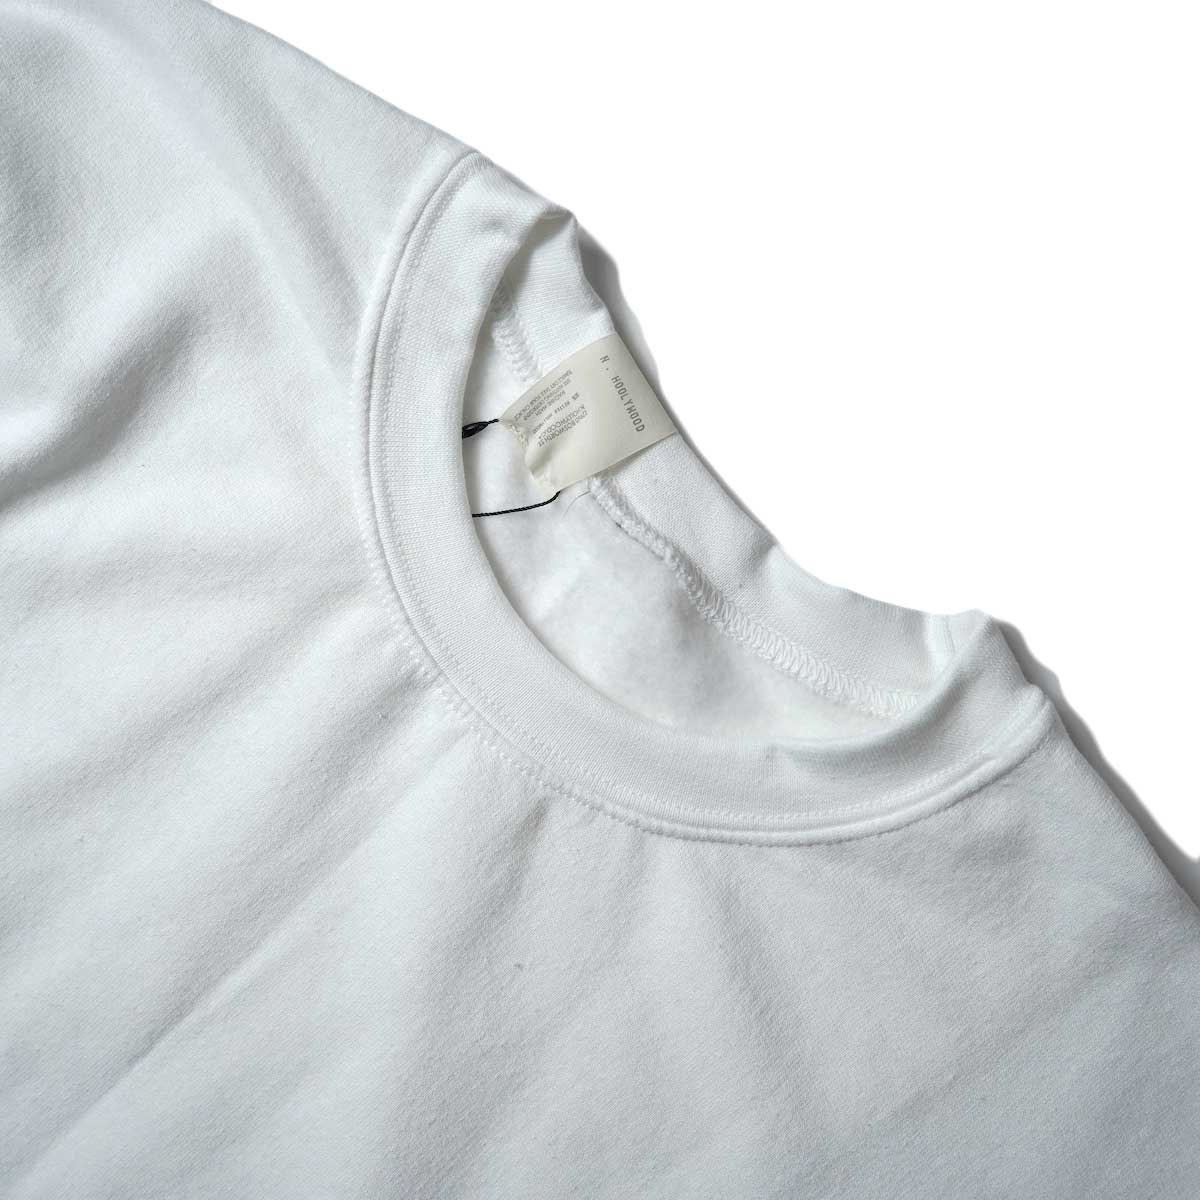 N.HOOLYWOOD / 9212-CS85 Crew Neck Sweat Shirt (White)襟